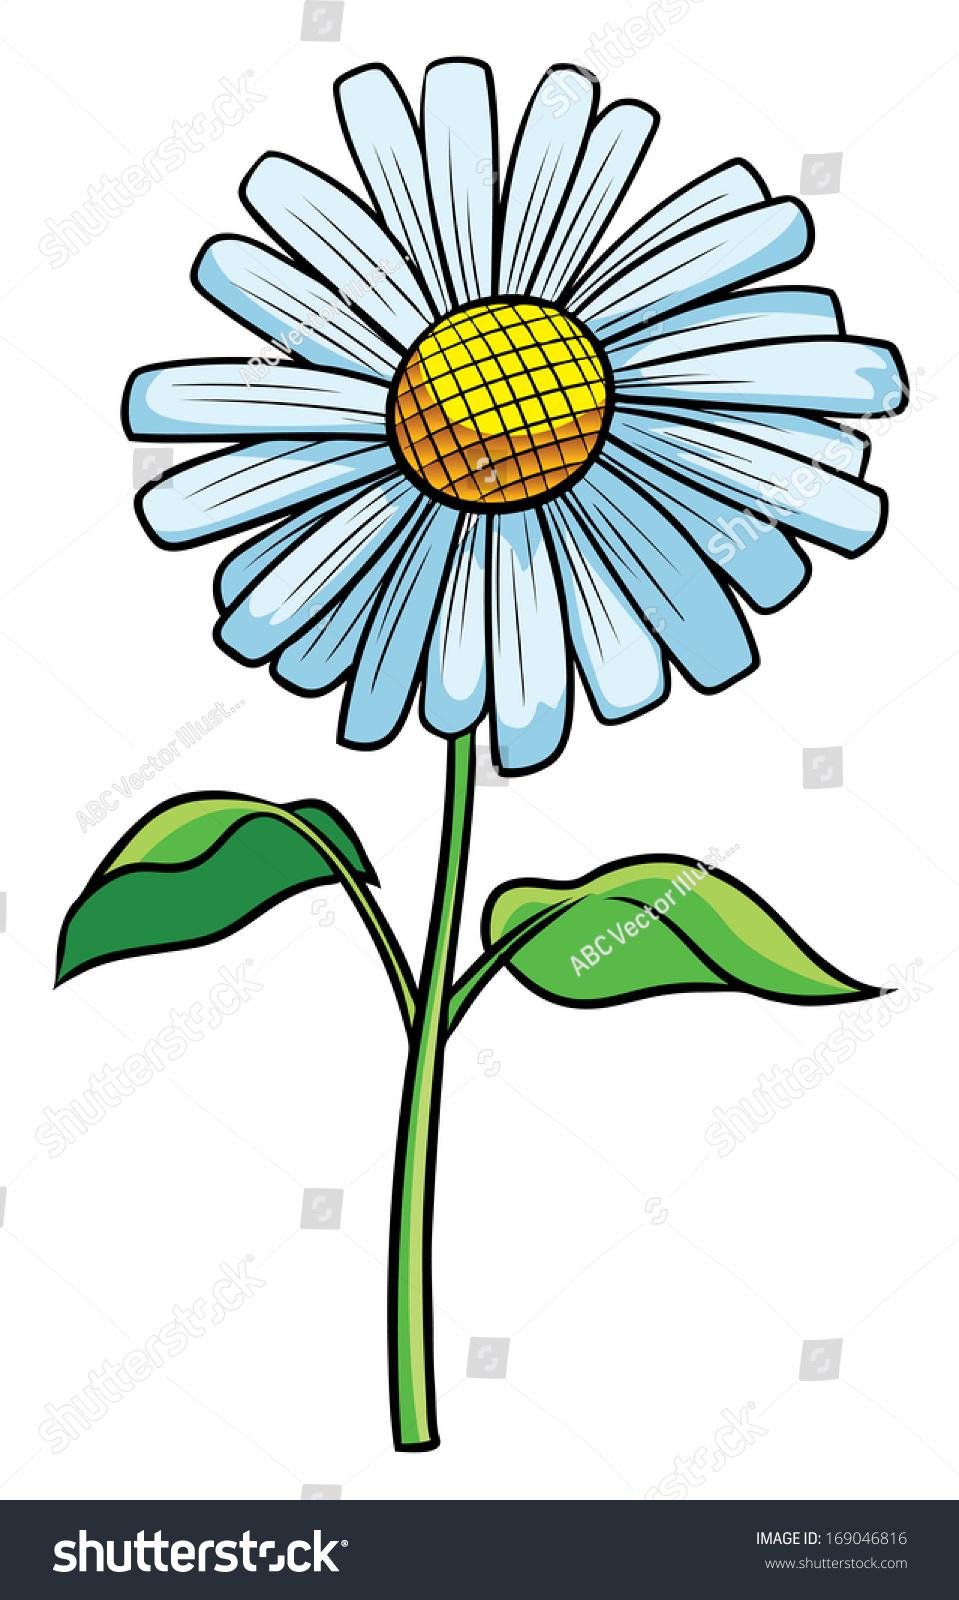 Daisy flower cartoon illustration stock illustration 169046816 daisy flower cartoon illustration izmirmasajfo